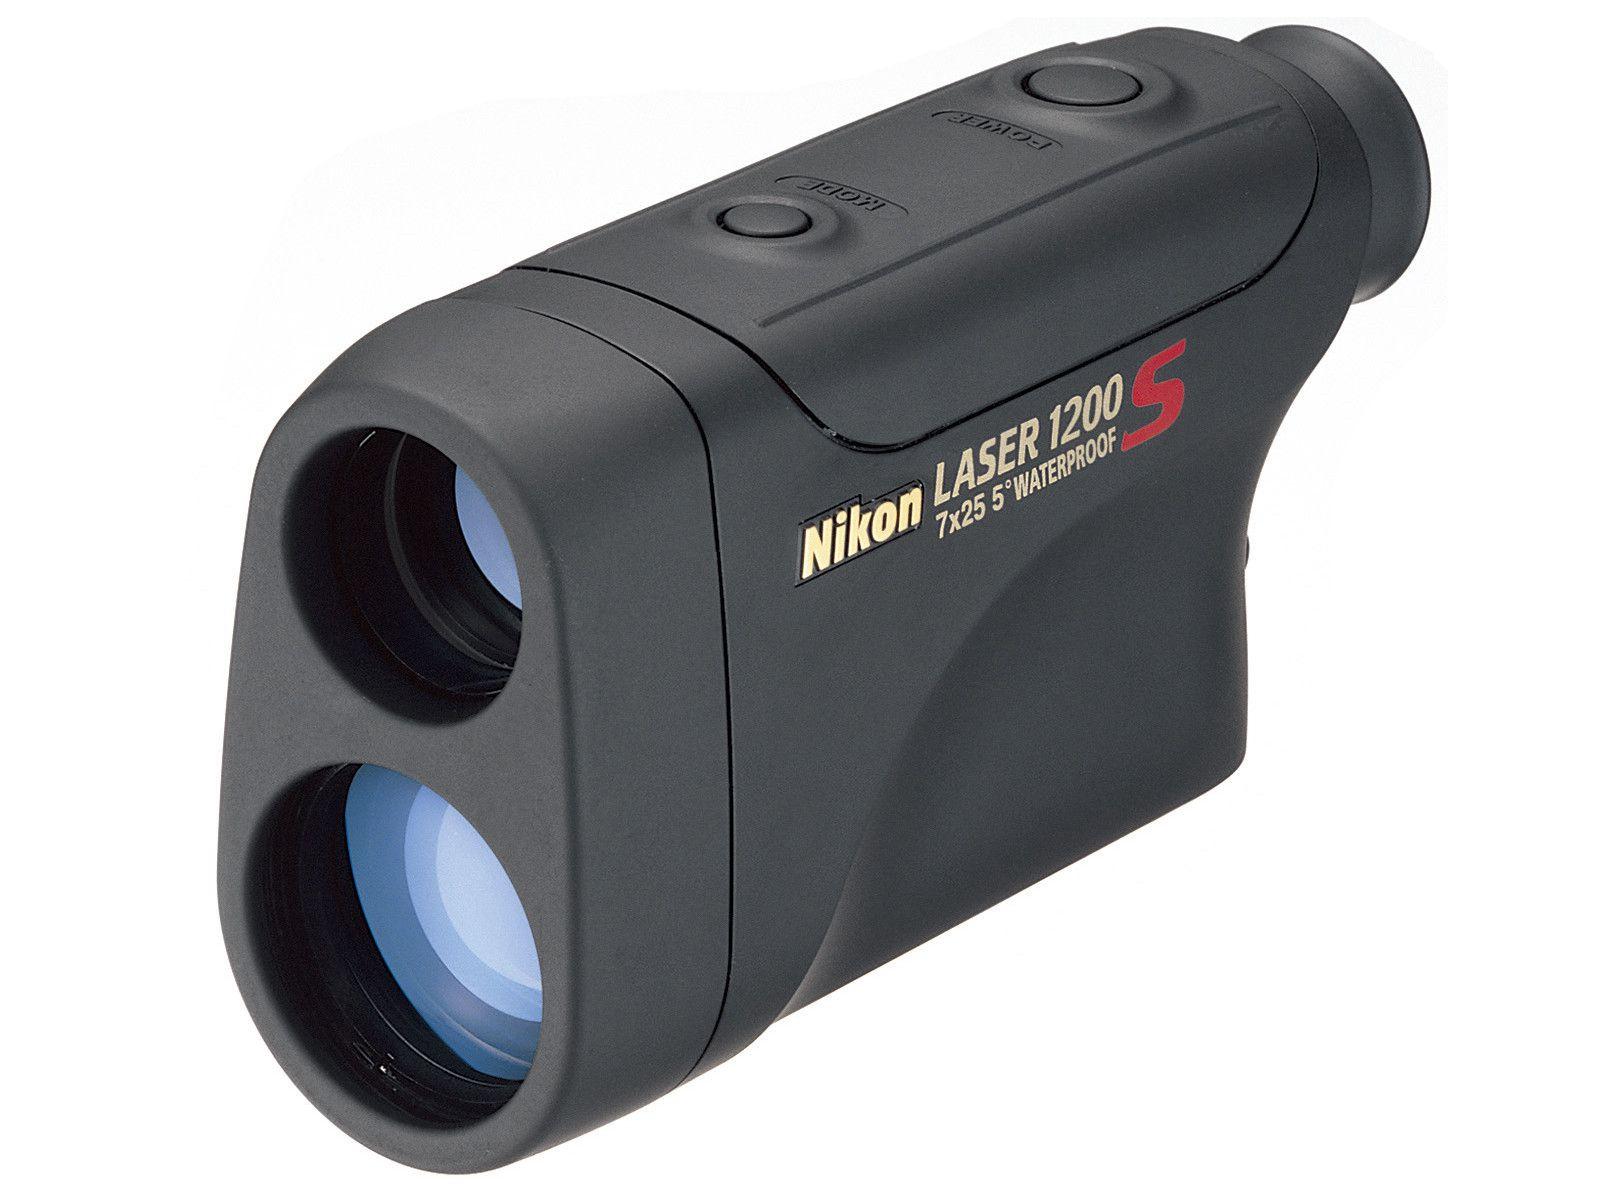 Laser 1200S 雷射測距望遠鏡